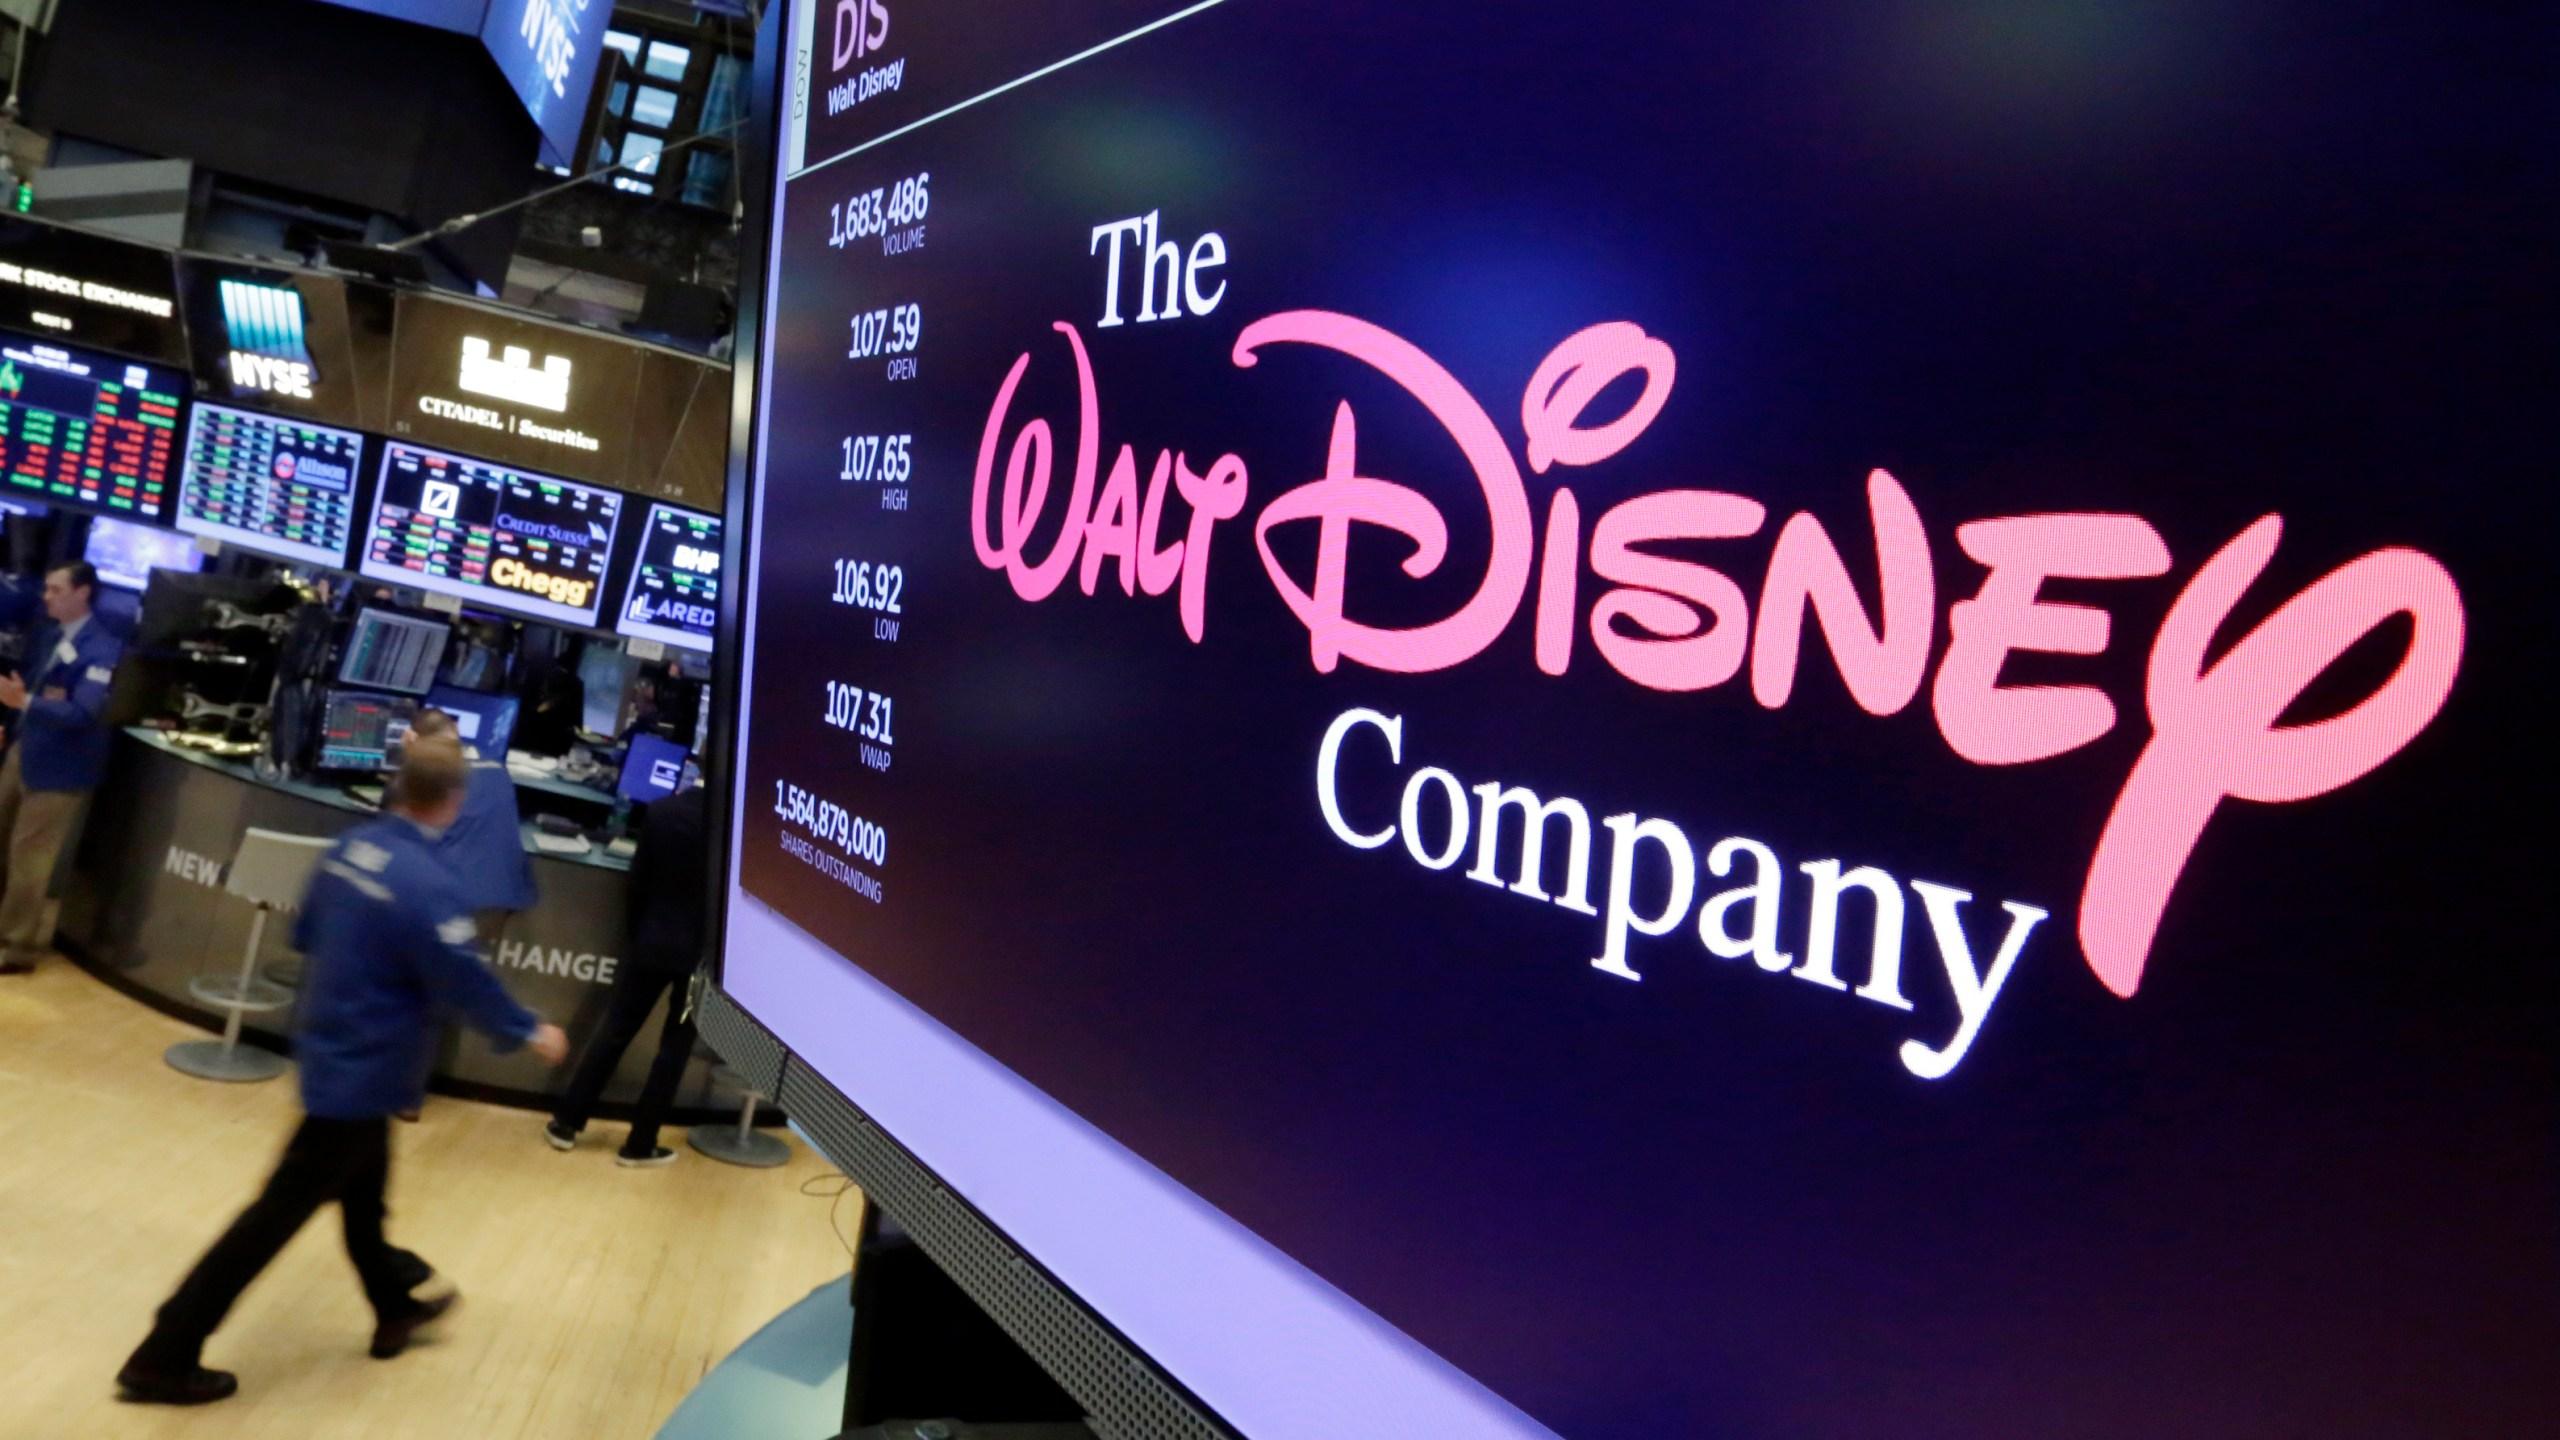 The Walt Disney Company